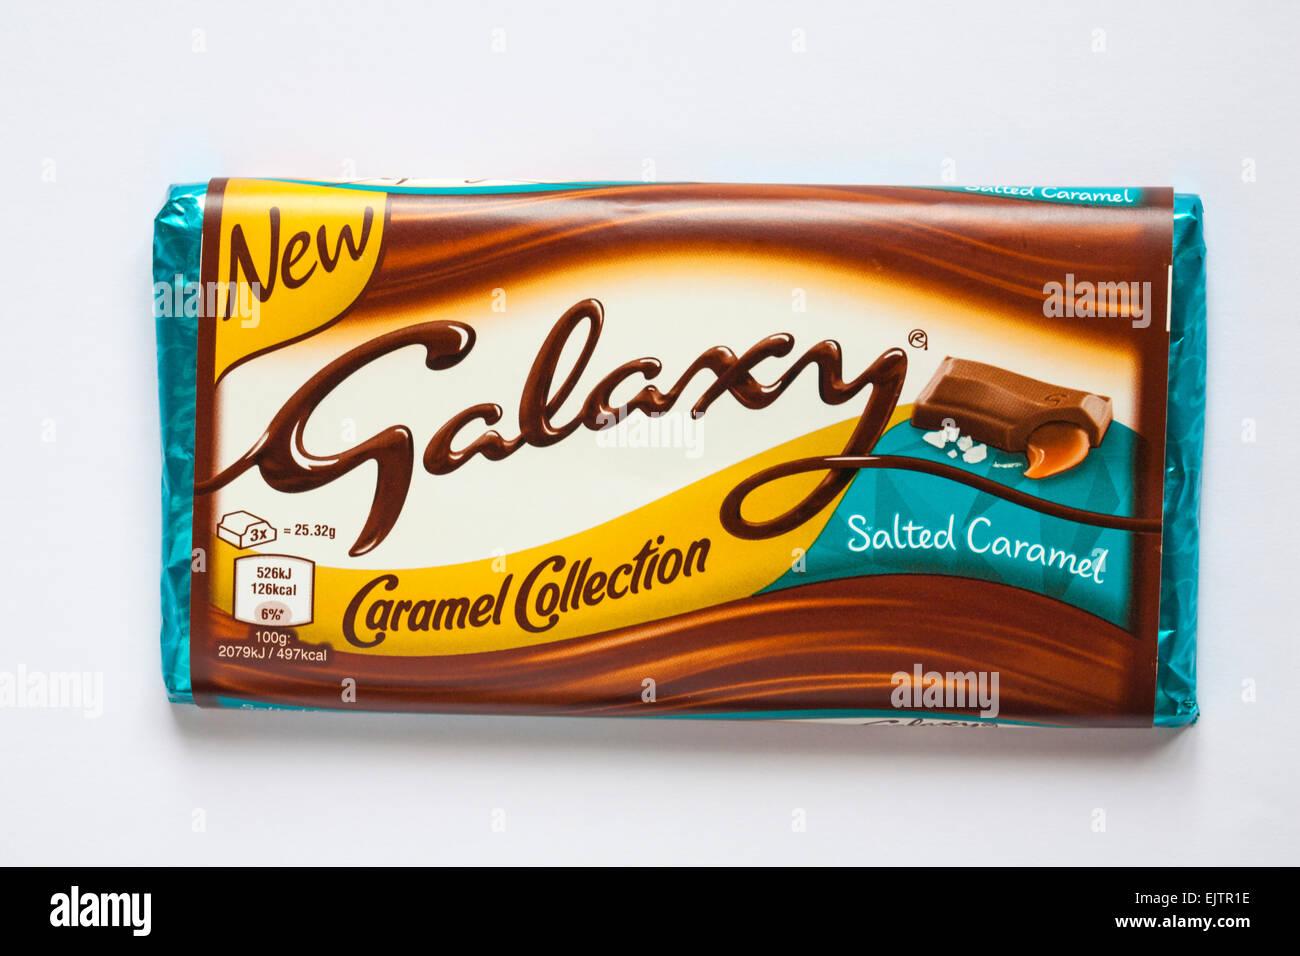 Galaxy Chocolate Logo Stock Photos & Galaxy Chocolate Logo Stock ...